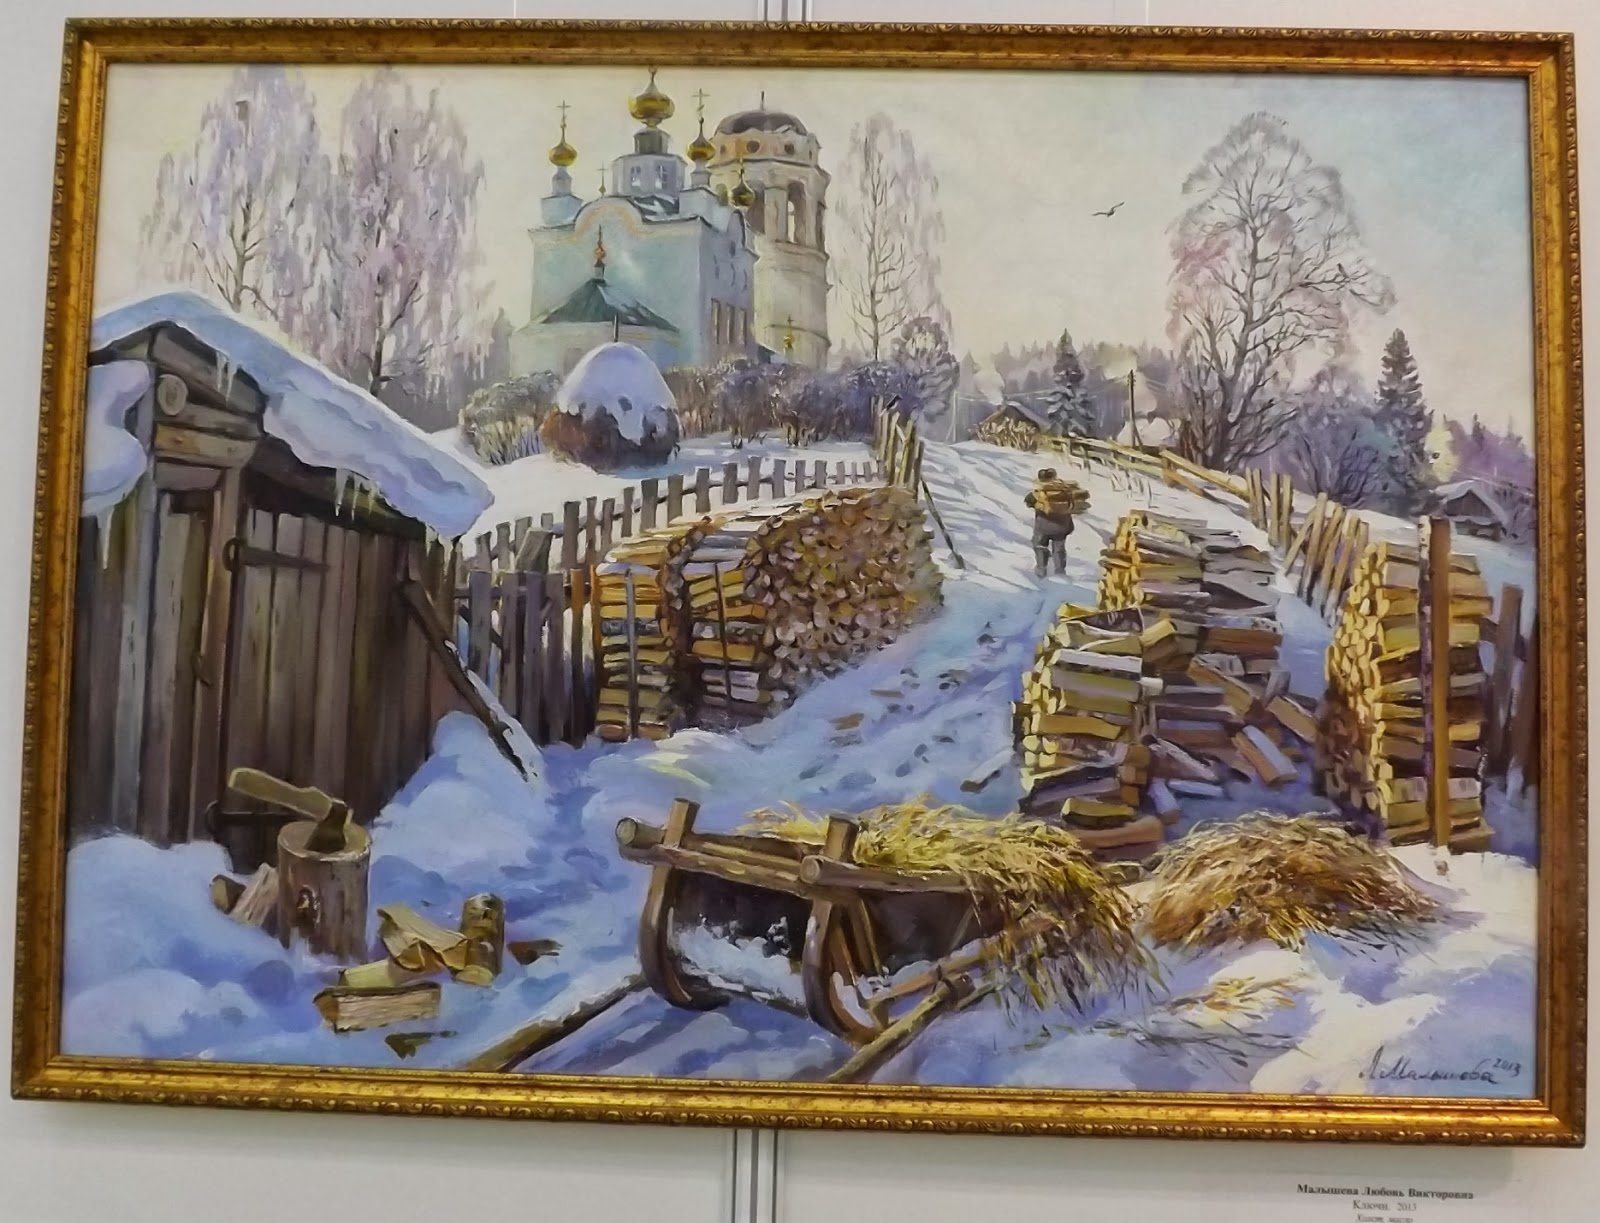 ковалев станислав романович художник перро сказки